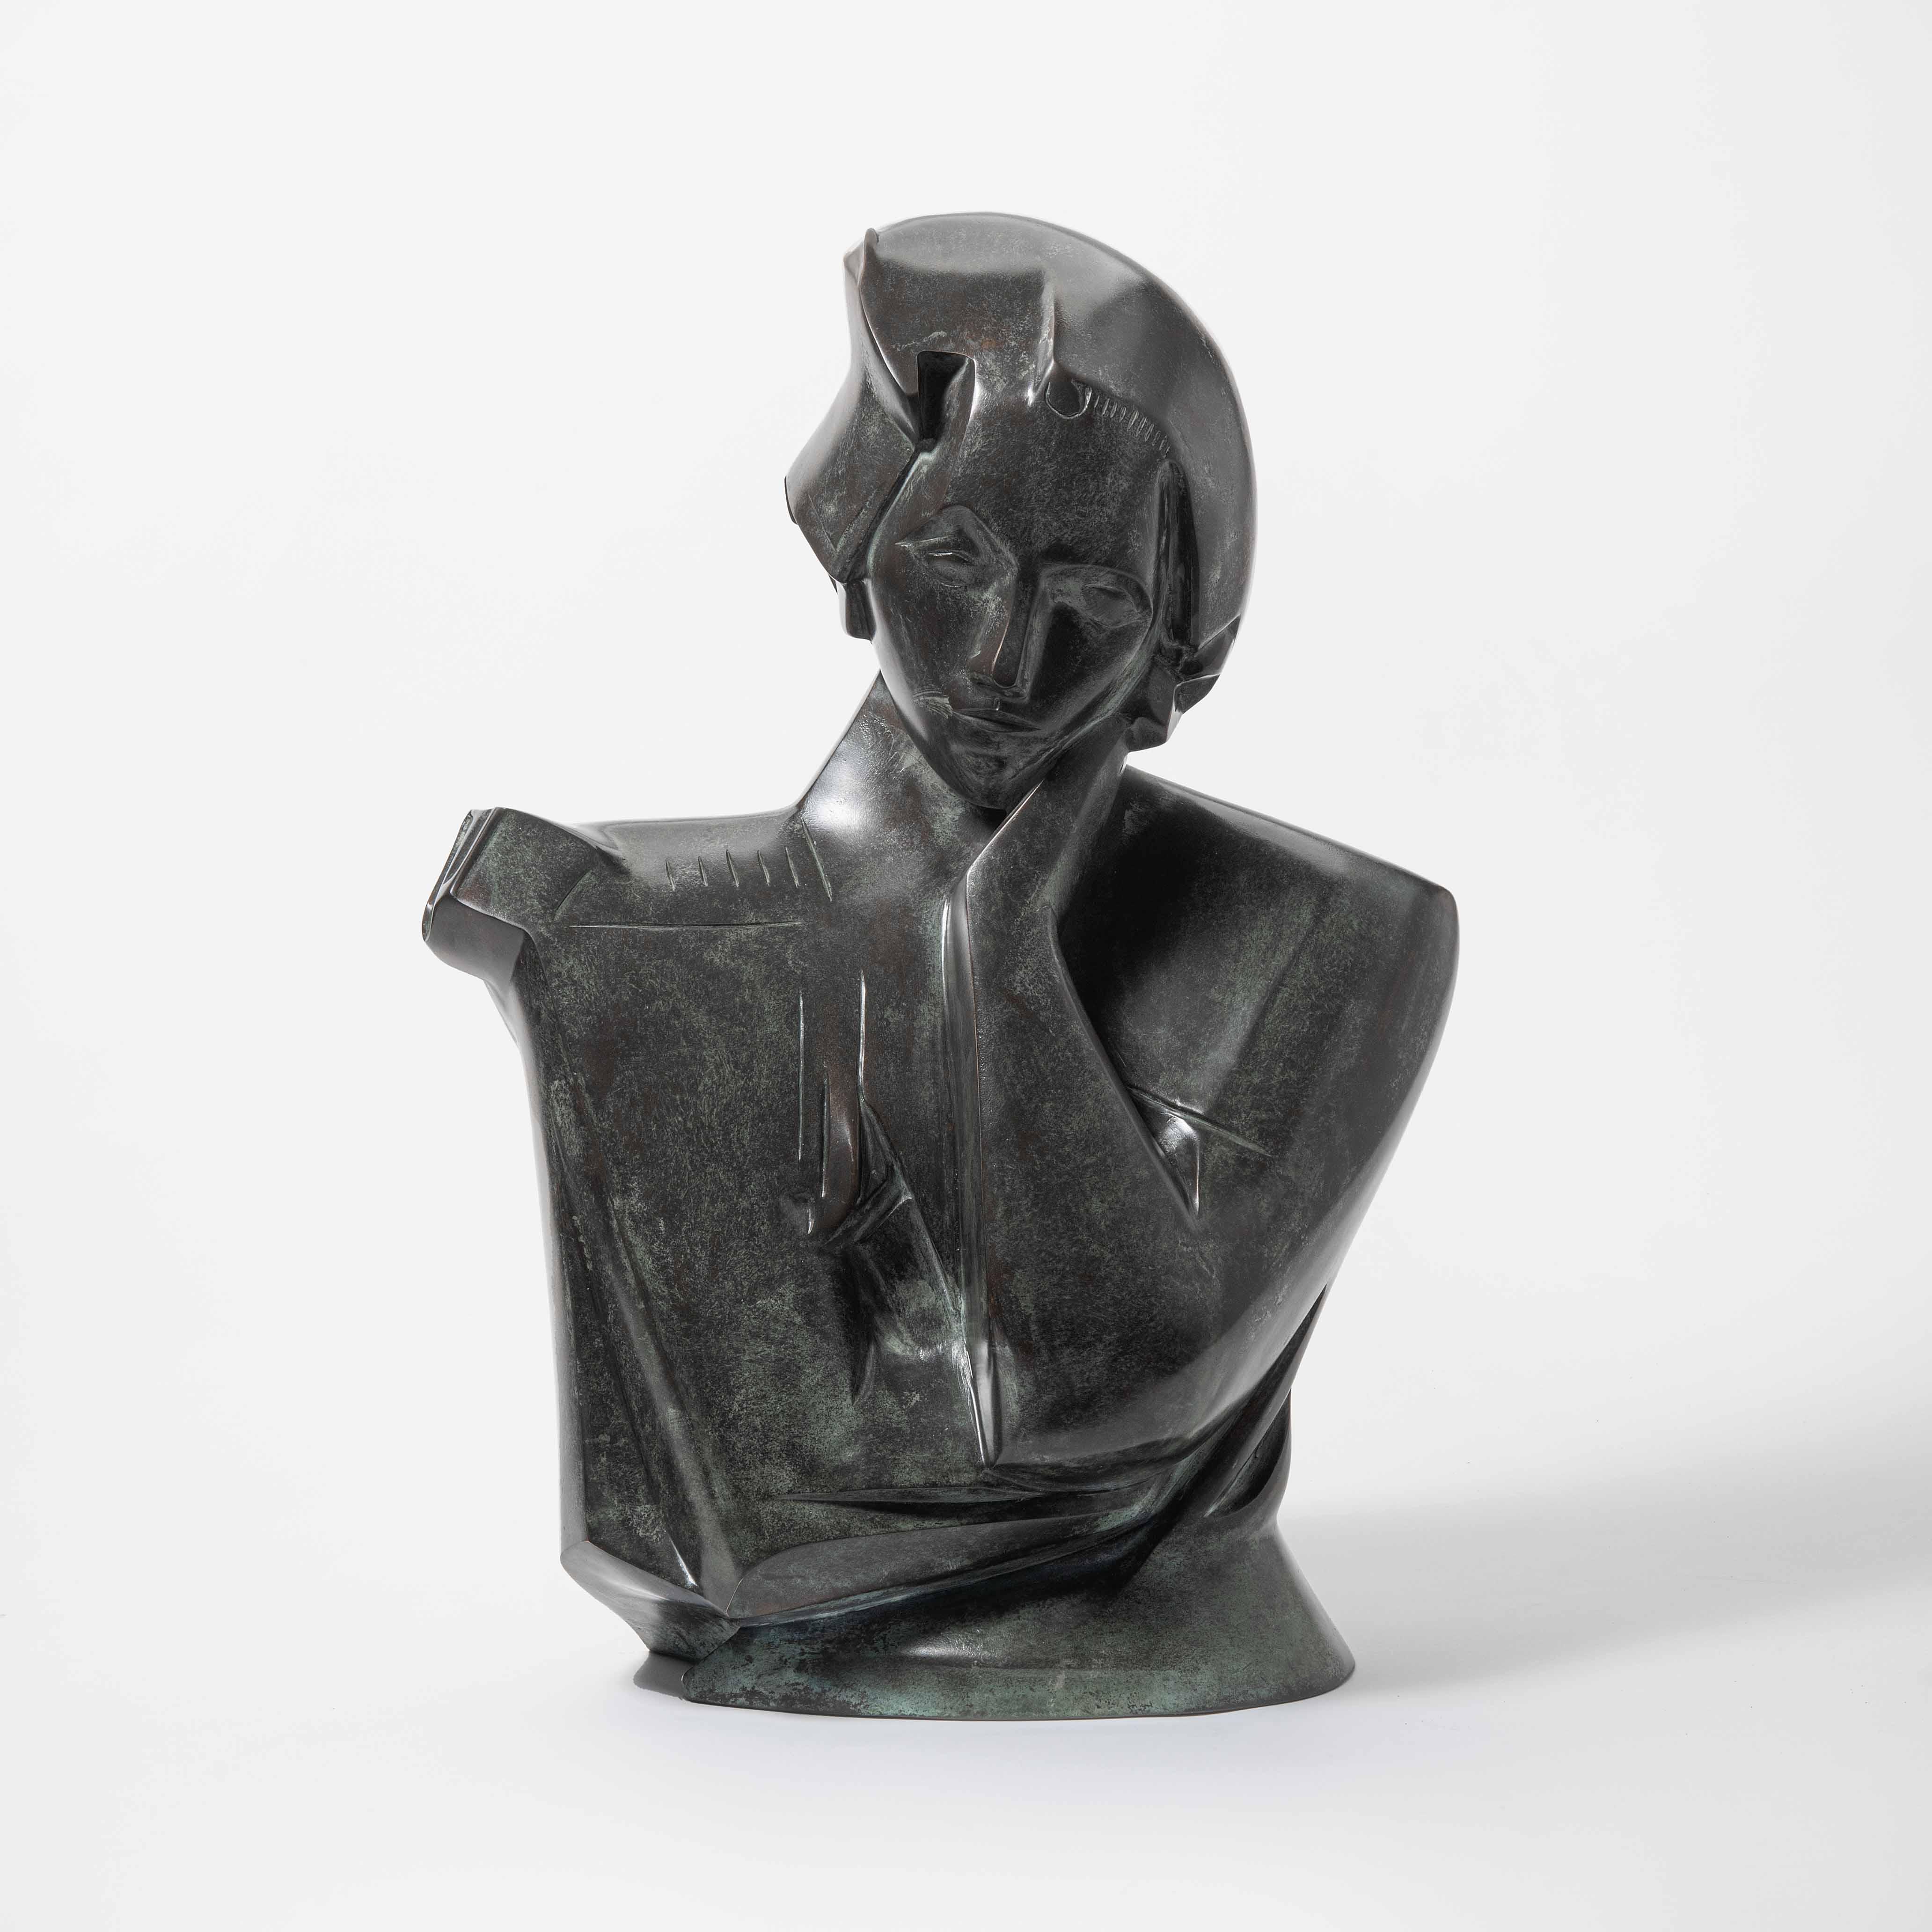 Femie Leunend op Elleboog (Femie Leaning on Elbow) (1929)